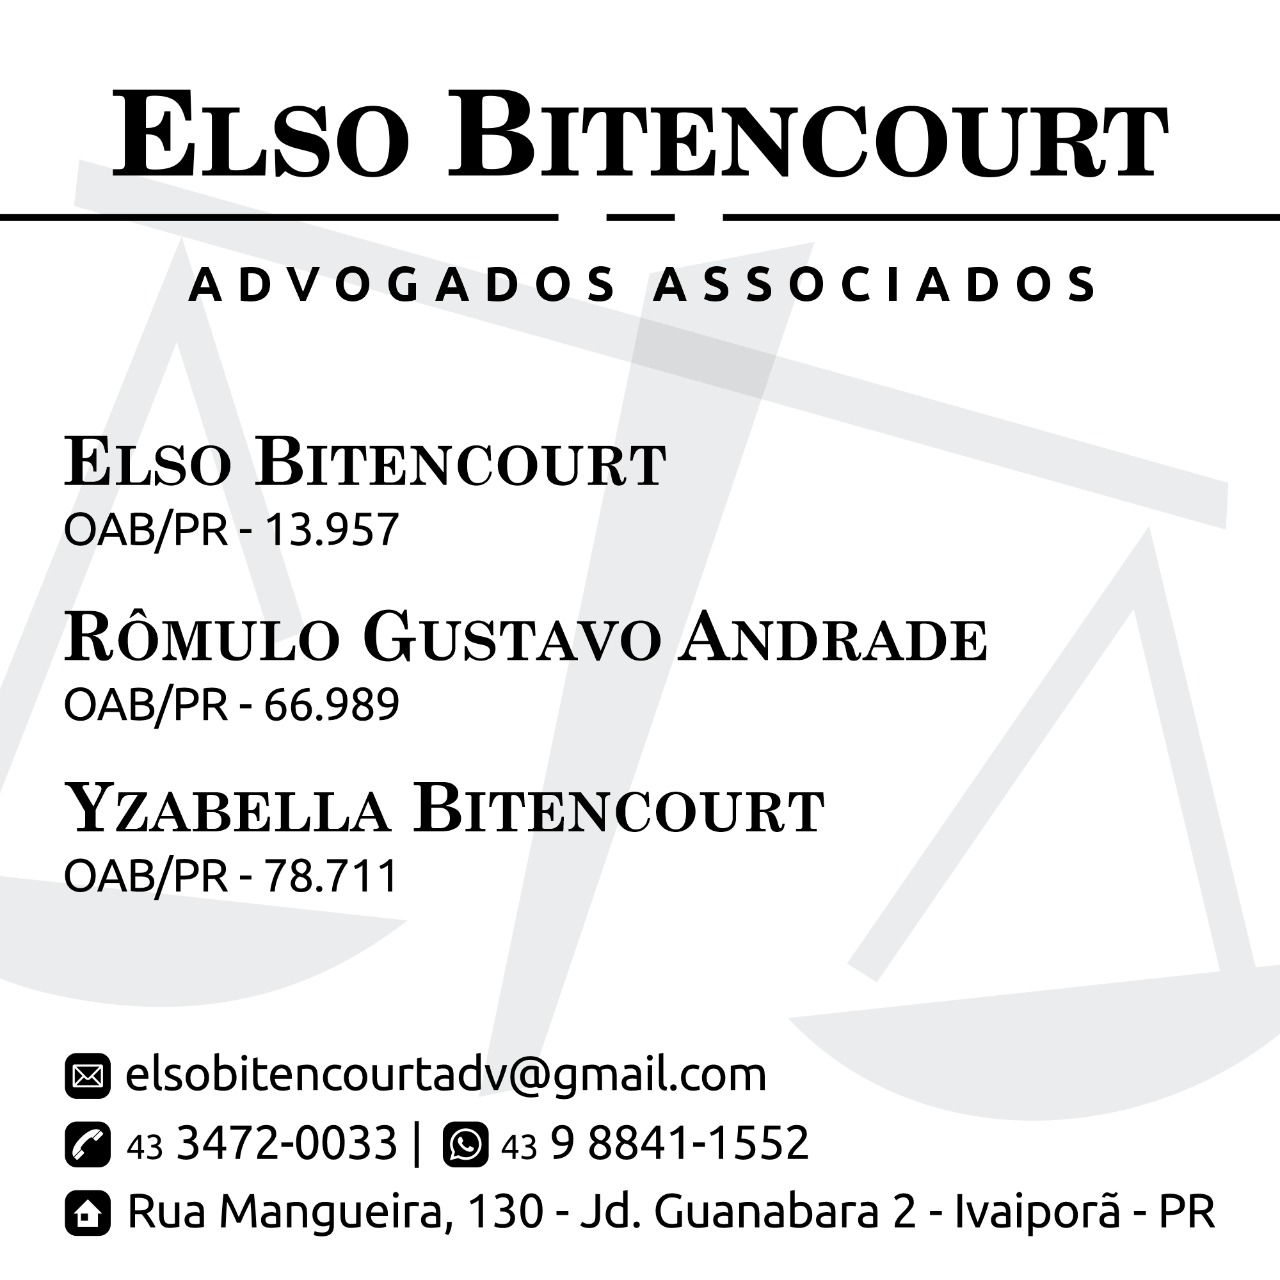 Elso Bitencourt 1